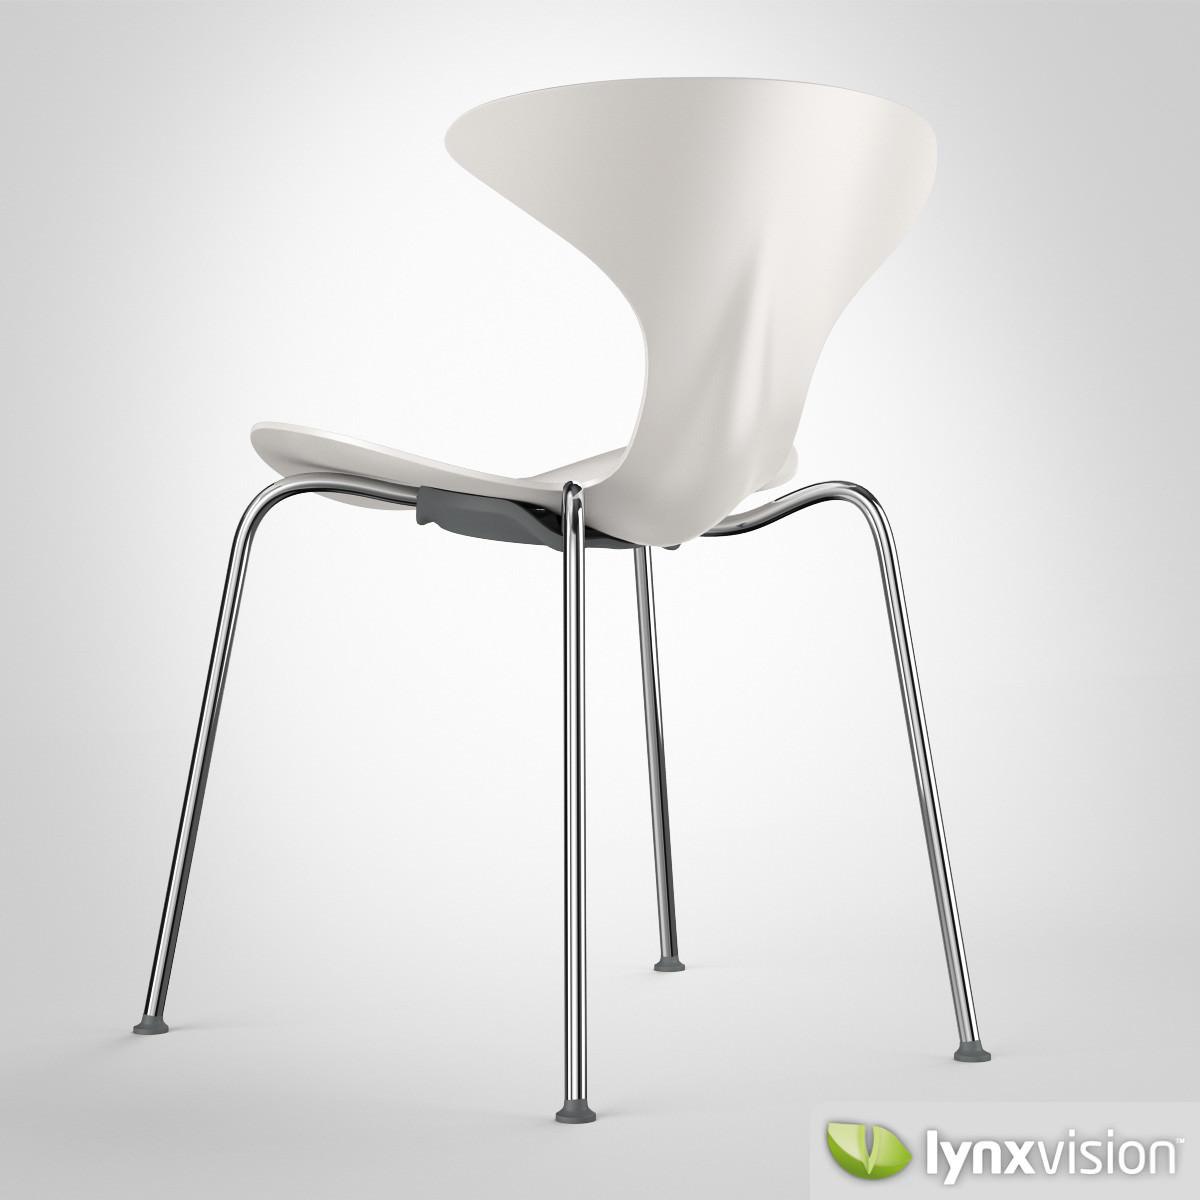 Beau ... Orbit Chair By Ross Lovegrove 3d Model Max Obj Fbx Mtl 5 ...